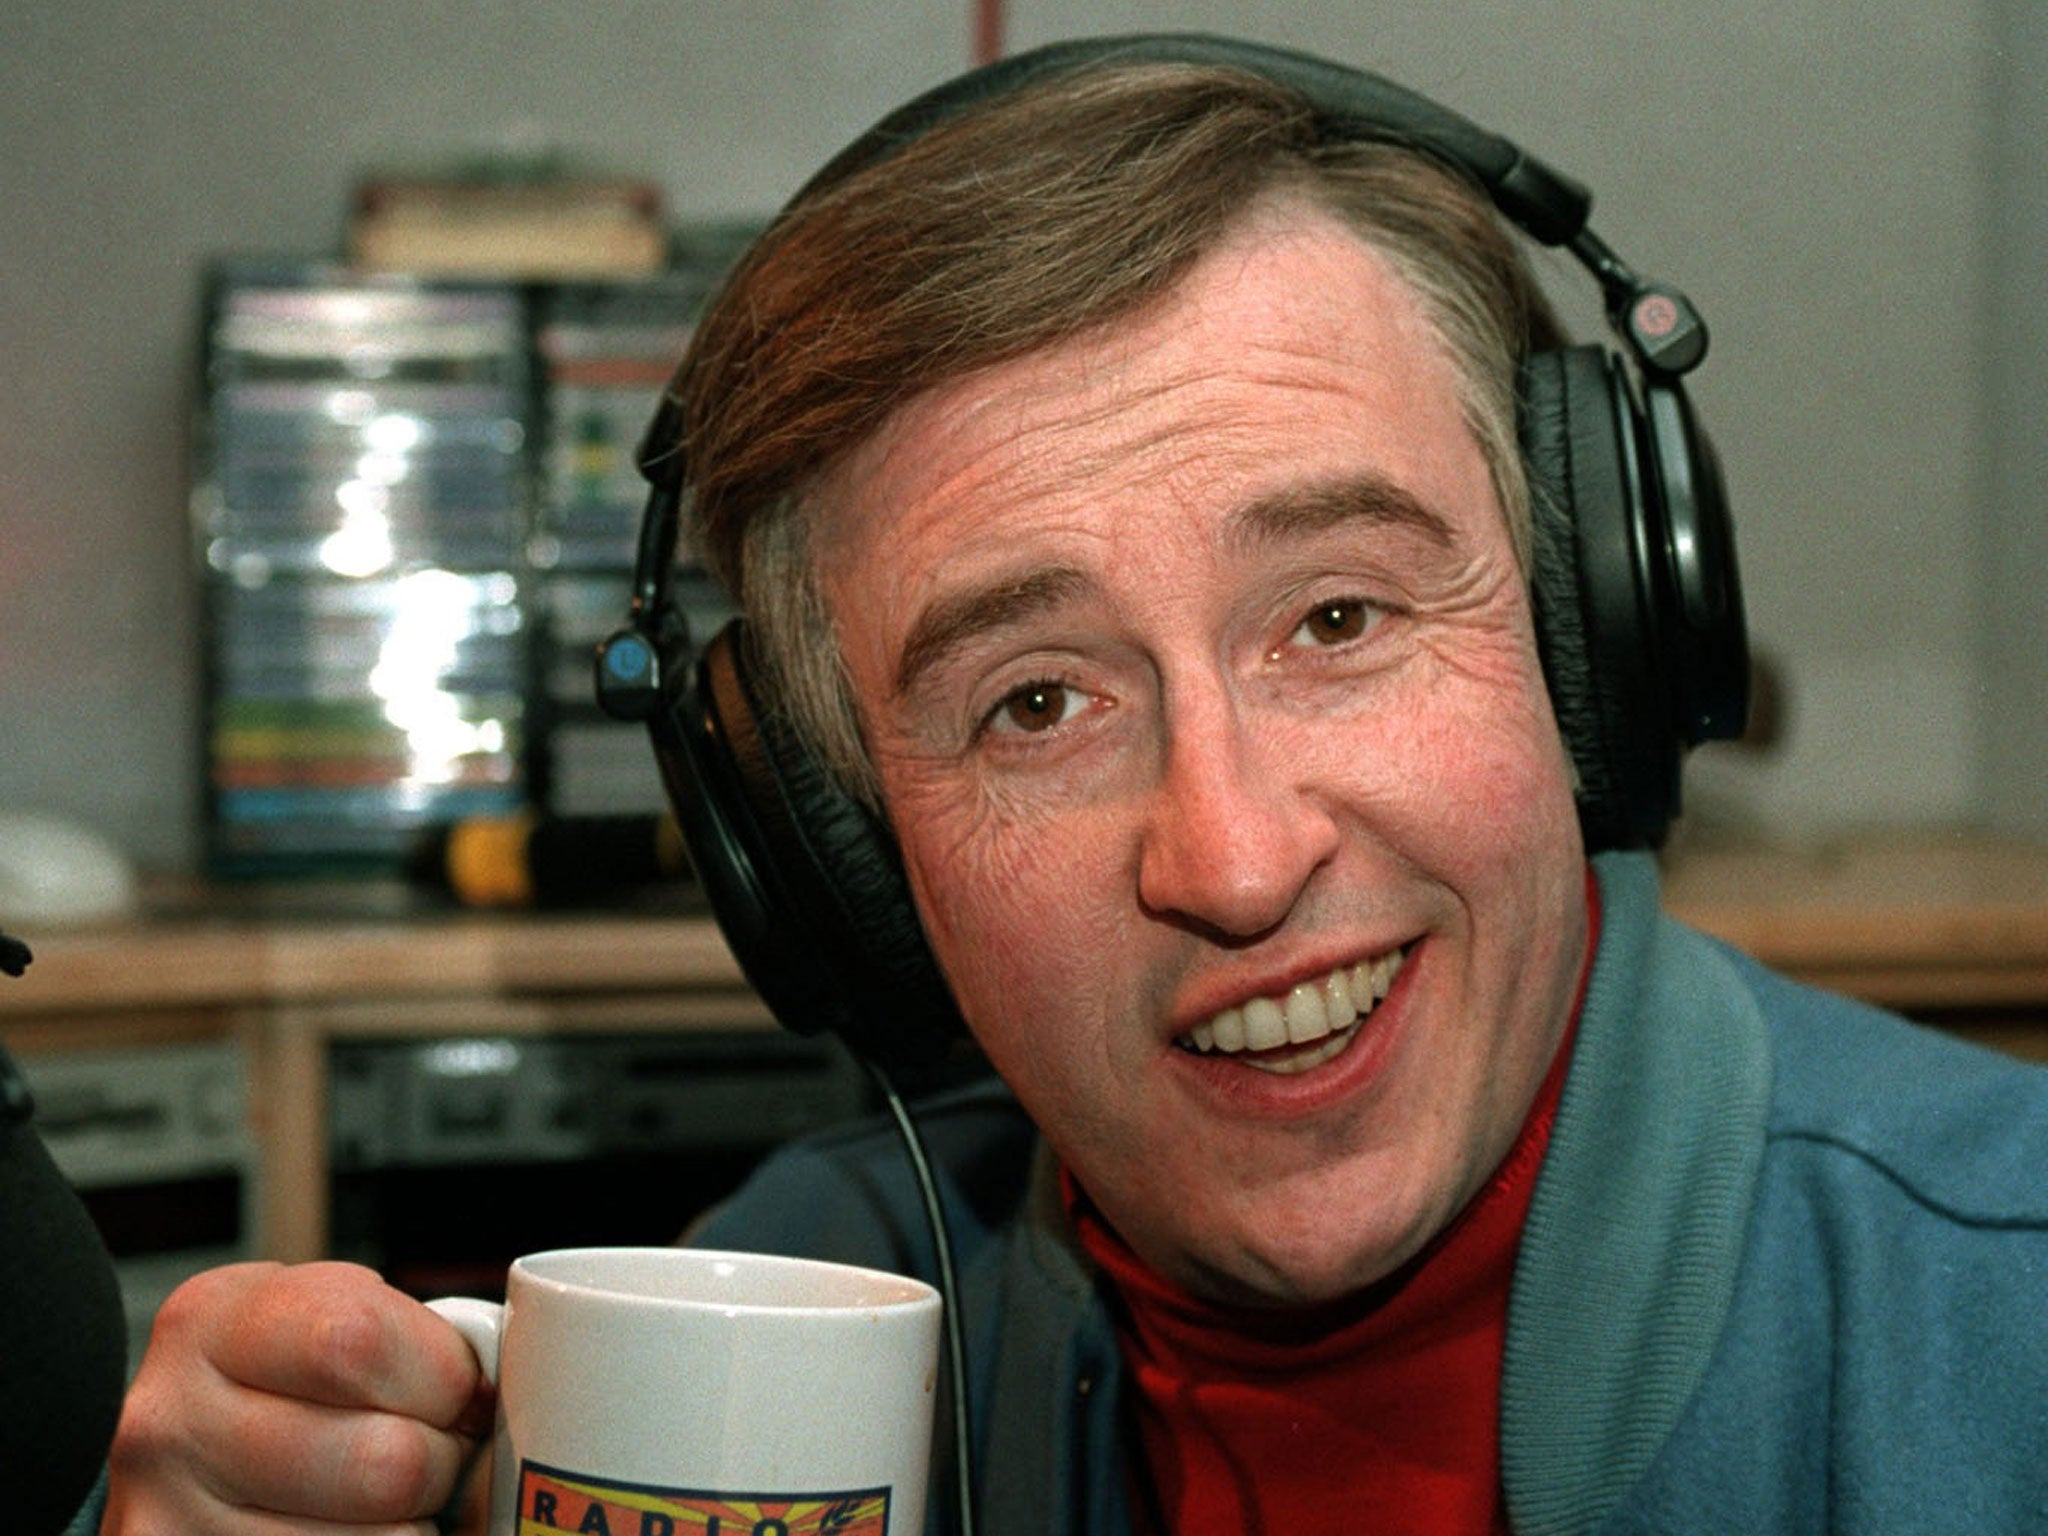 06-partridge-bbc.jpg